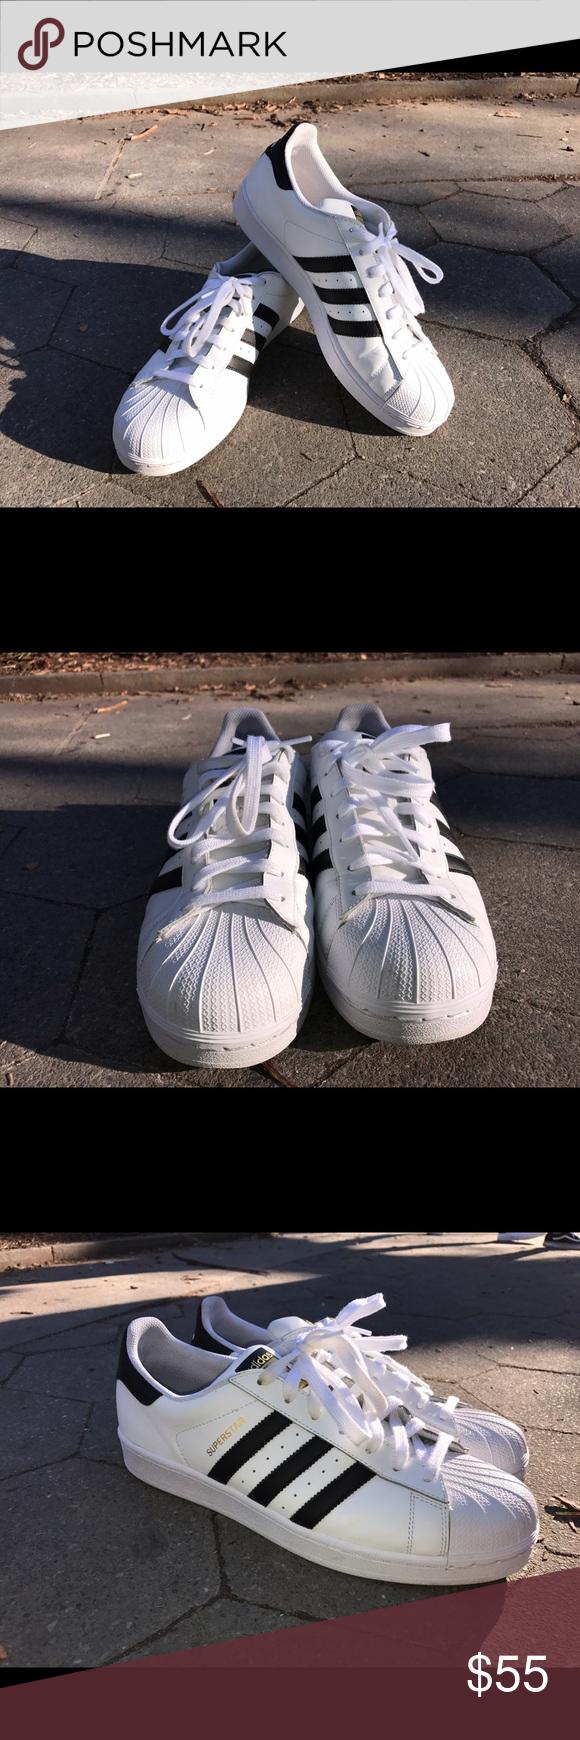 adidas superstar originale uomini bianchi taglia 10 adidas infame